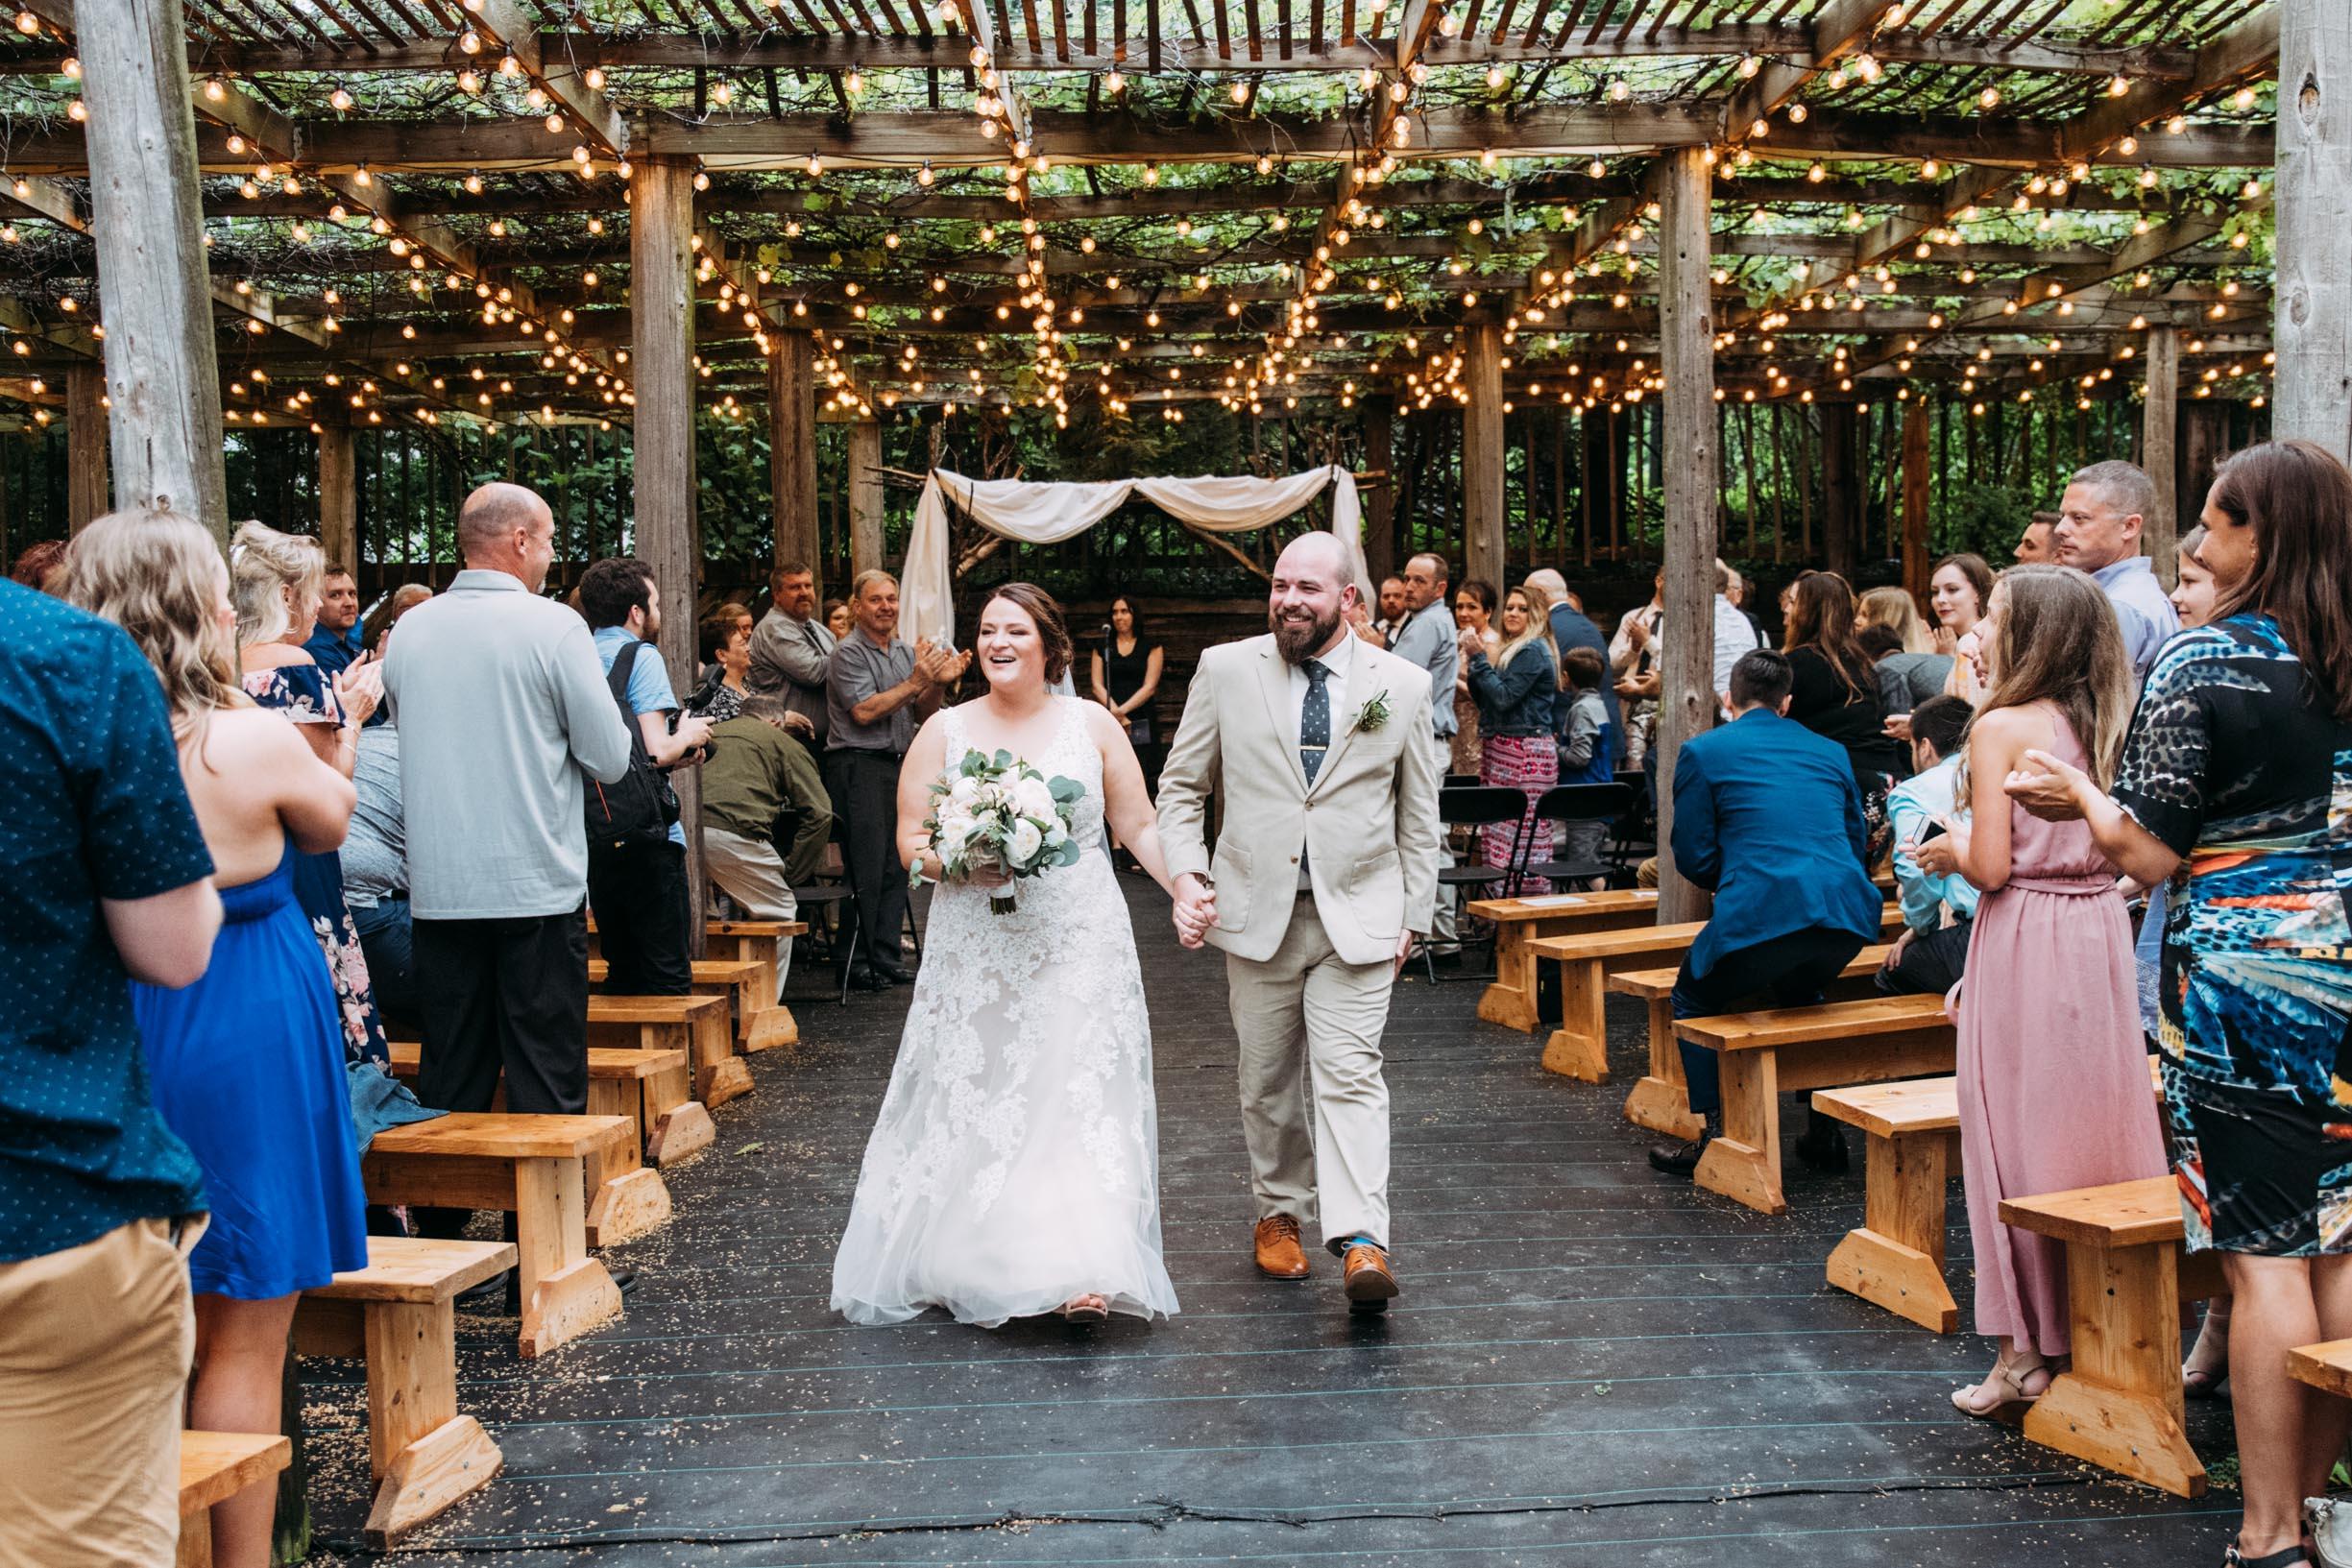 51-Jess_Jeremy_Minnesota_Wedding_Ceremony.jpg